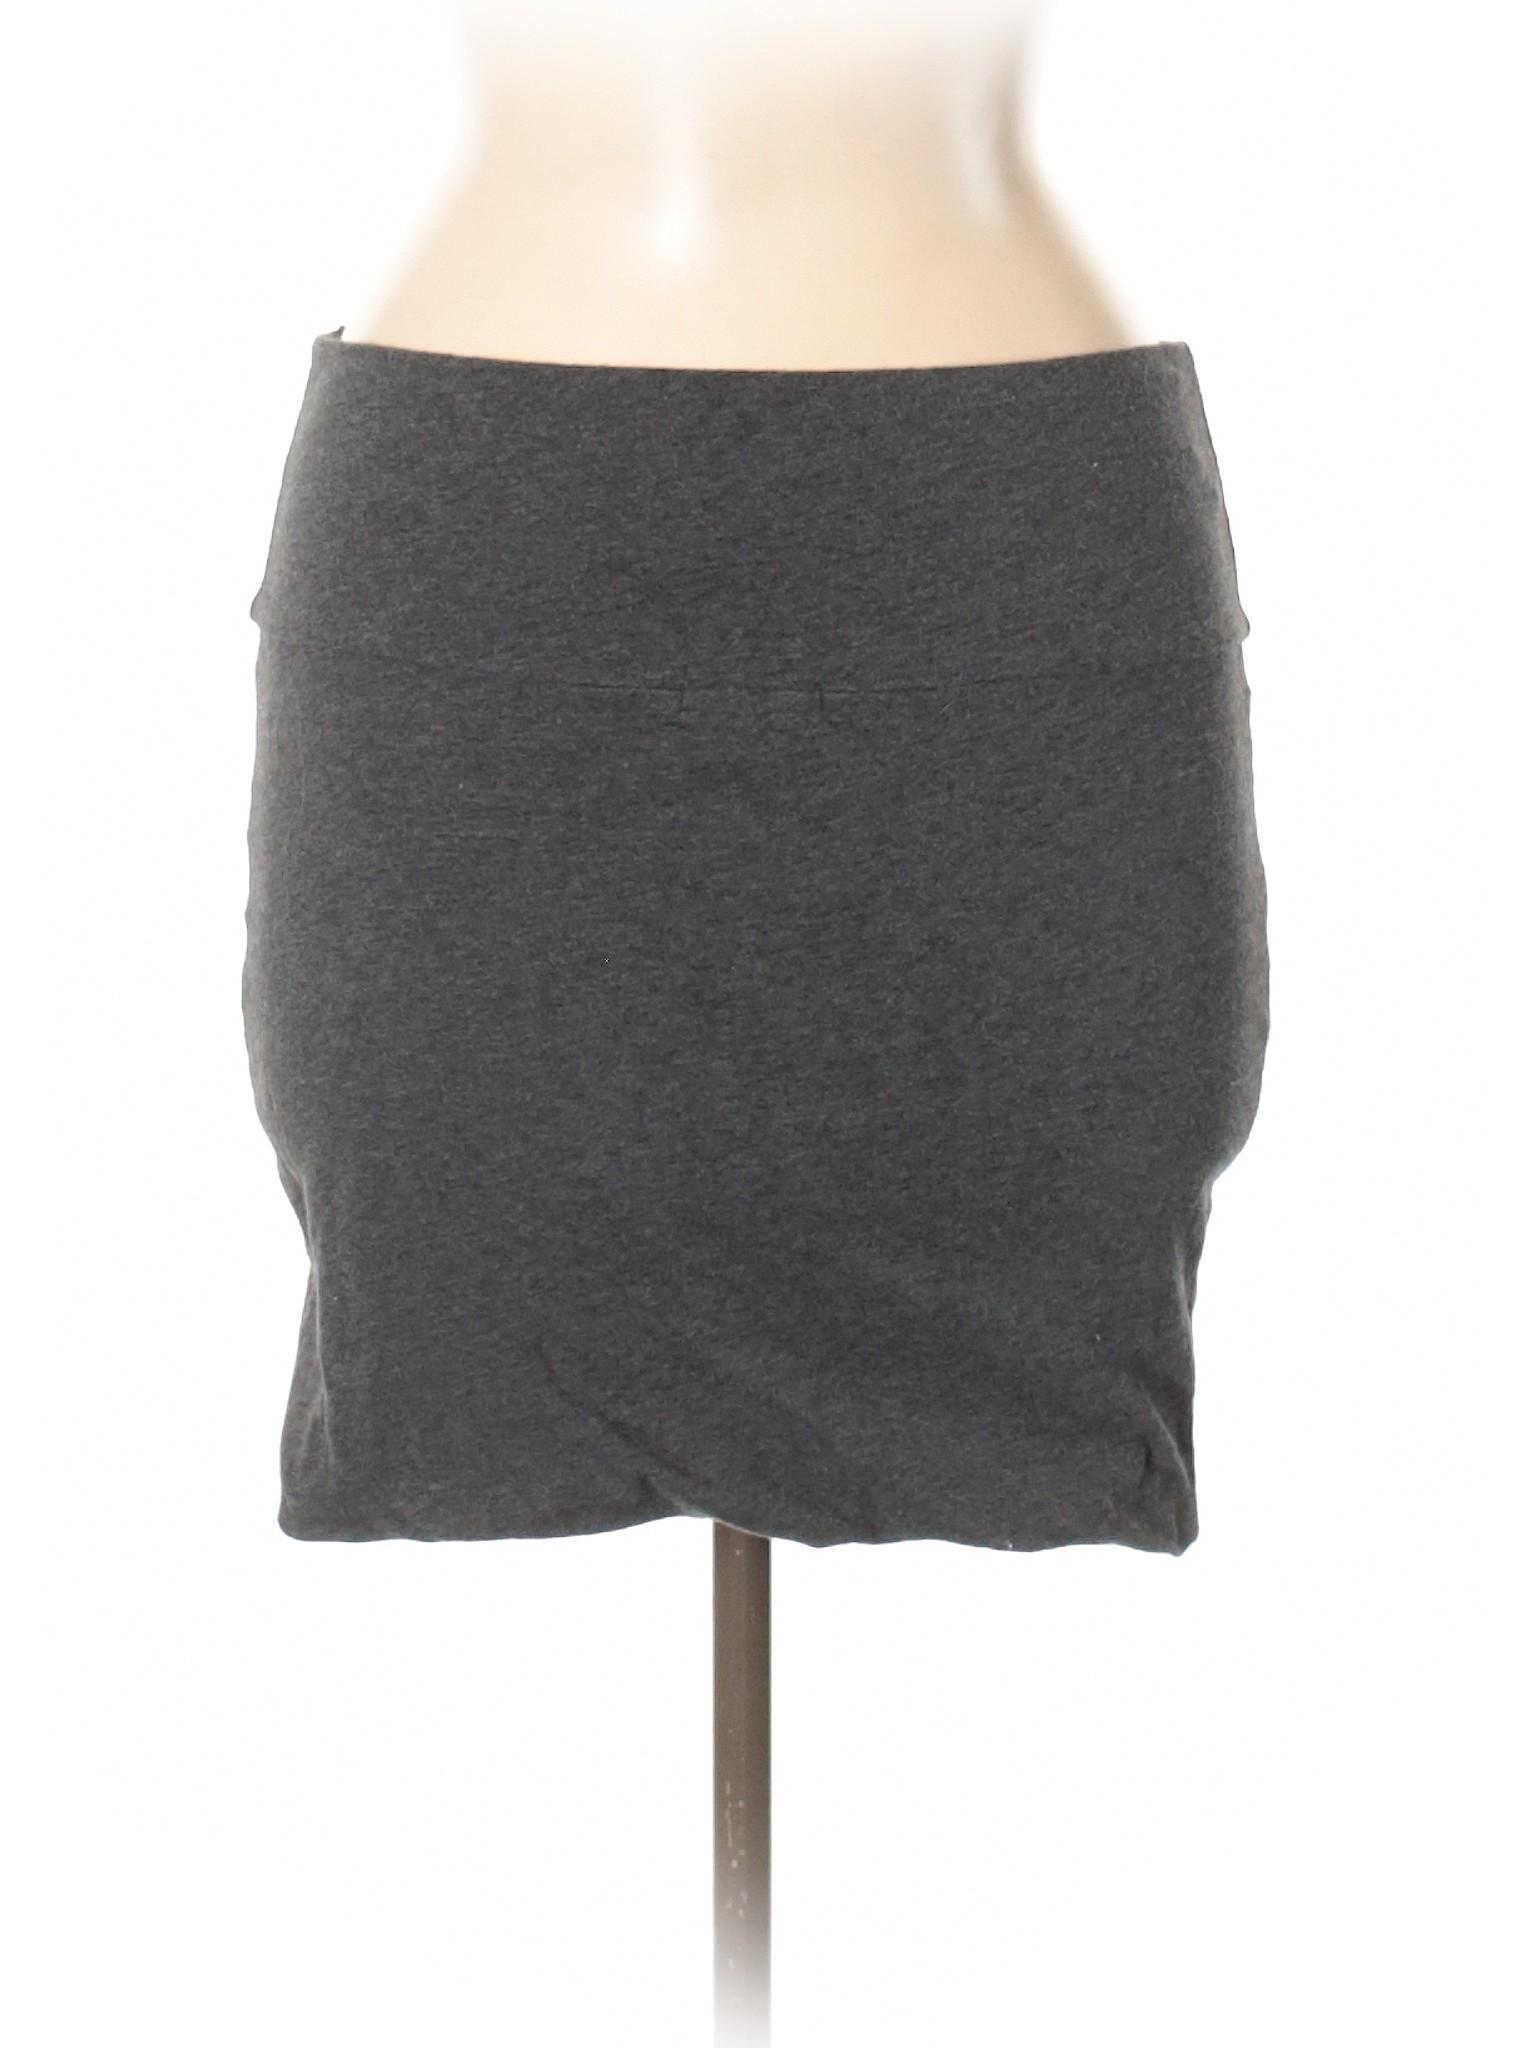 Casual Boutique Boutique Boutique Skirt Boutique Boutique Casual Skirt Boutique Casual Casual Skirt Skirt Skirt Casual Casual 6xwq0Ap